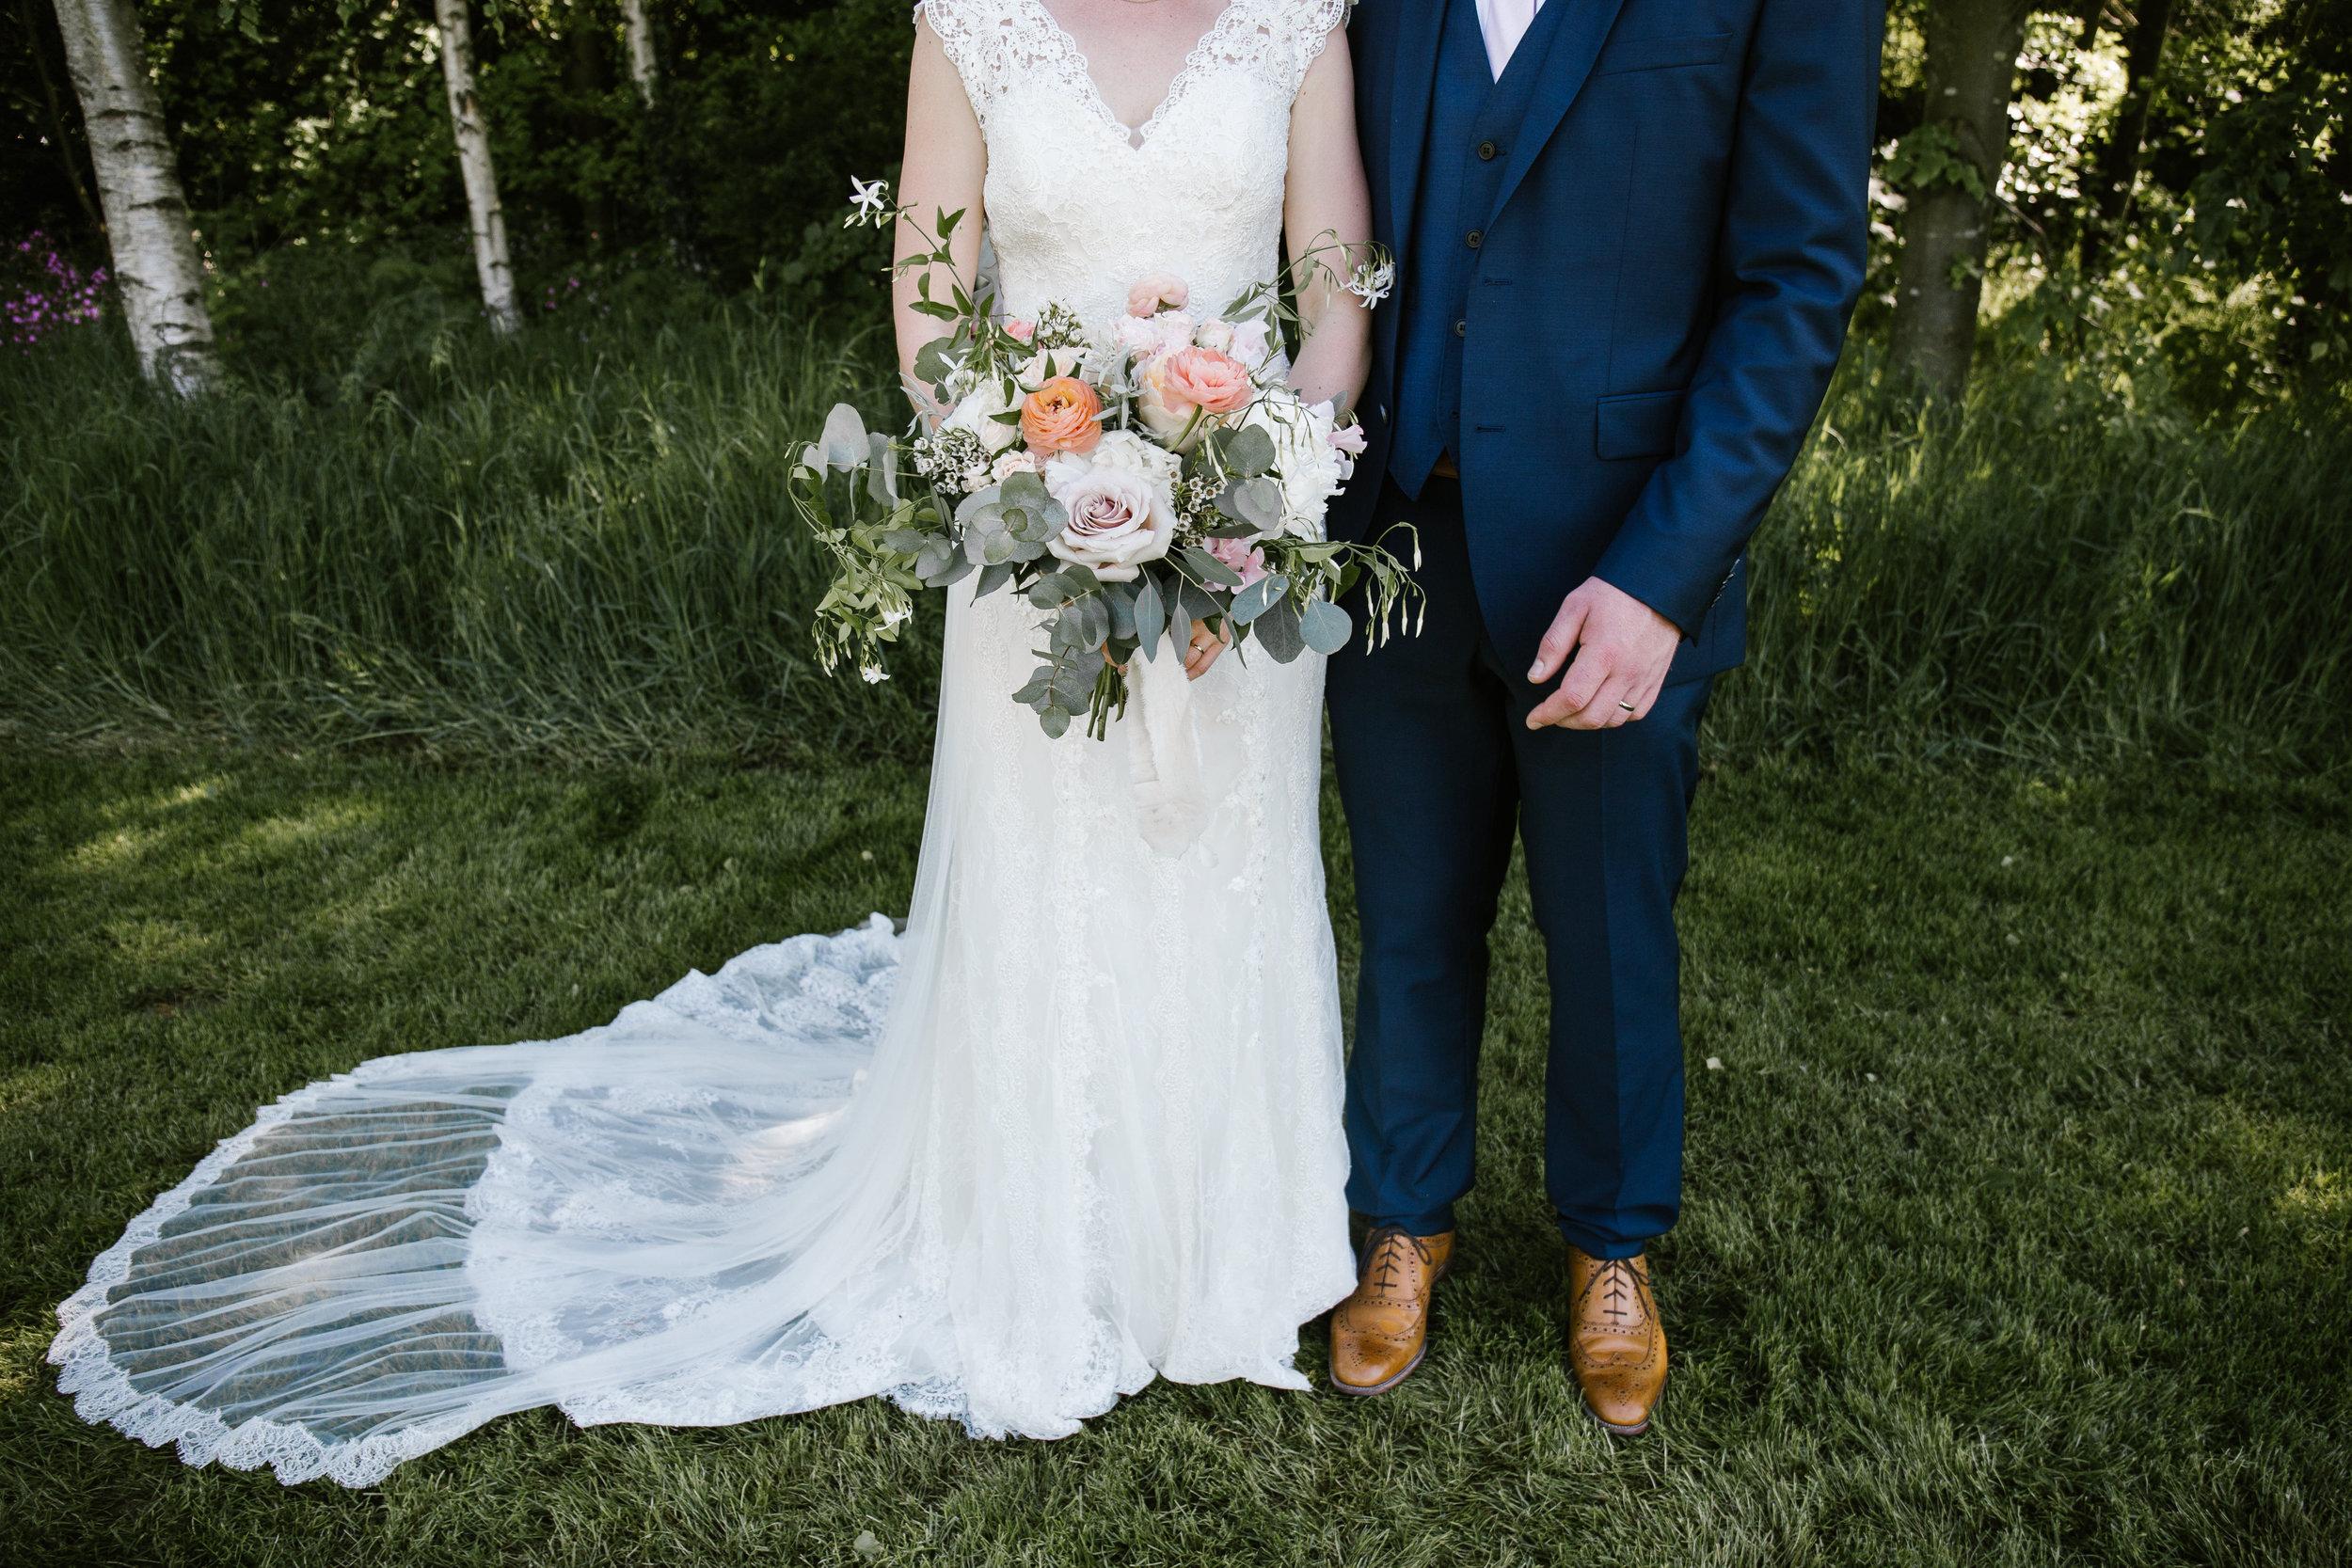 Beth + Will, Chaucer Barns, Chaucer Barns Wedding, Spring Wedding-196.jpg